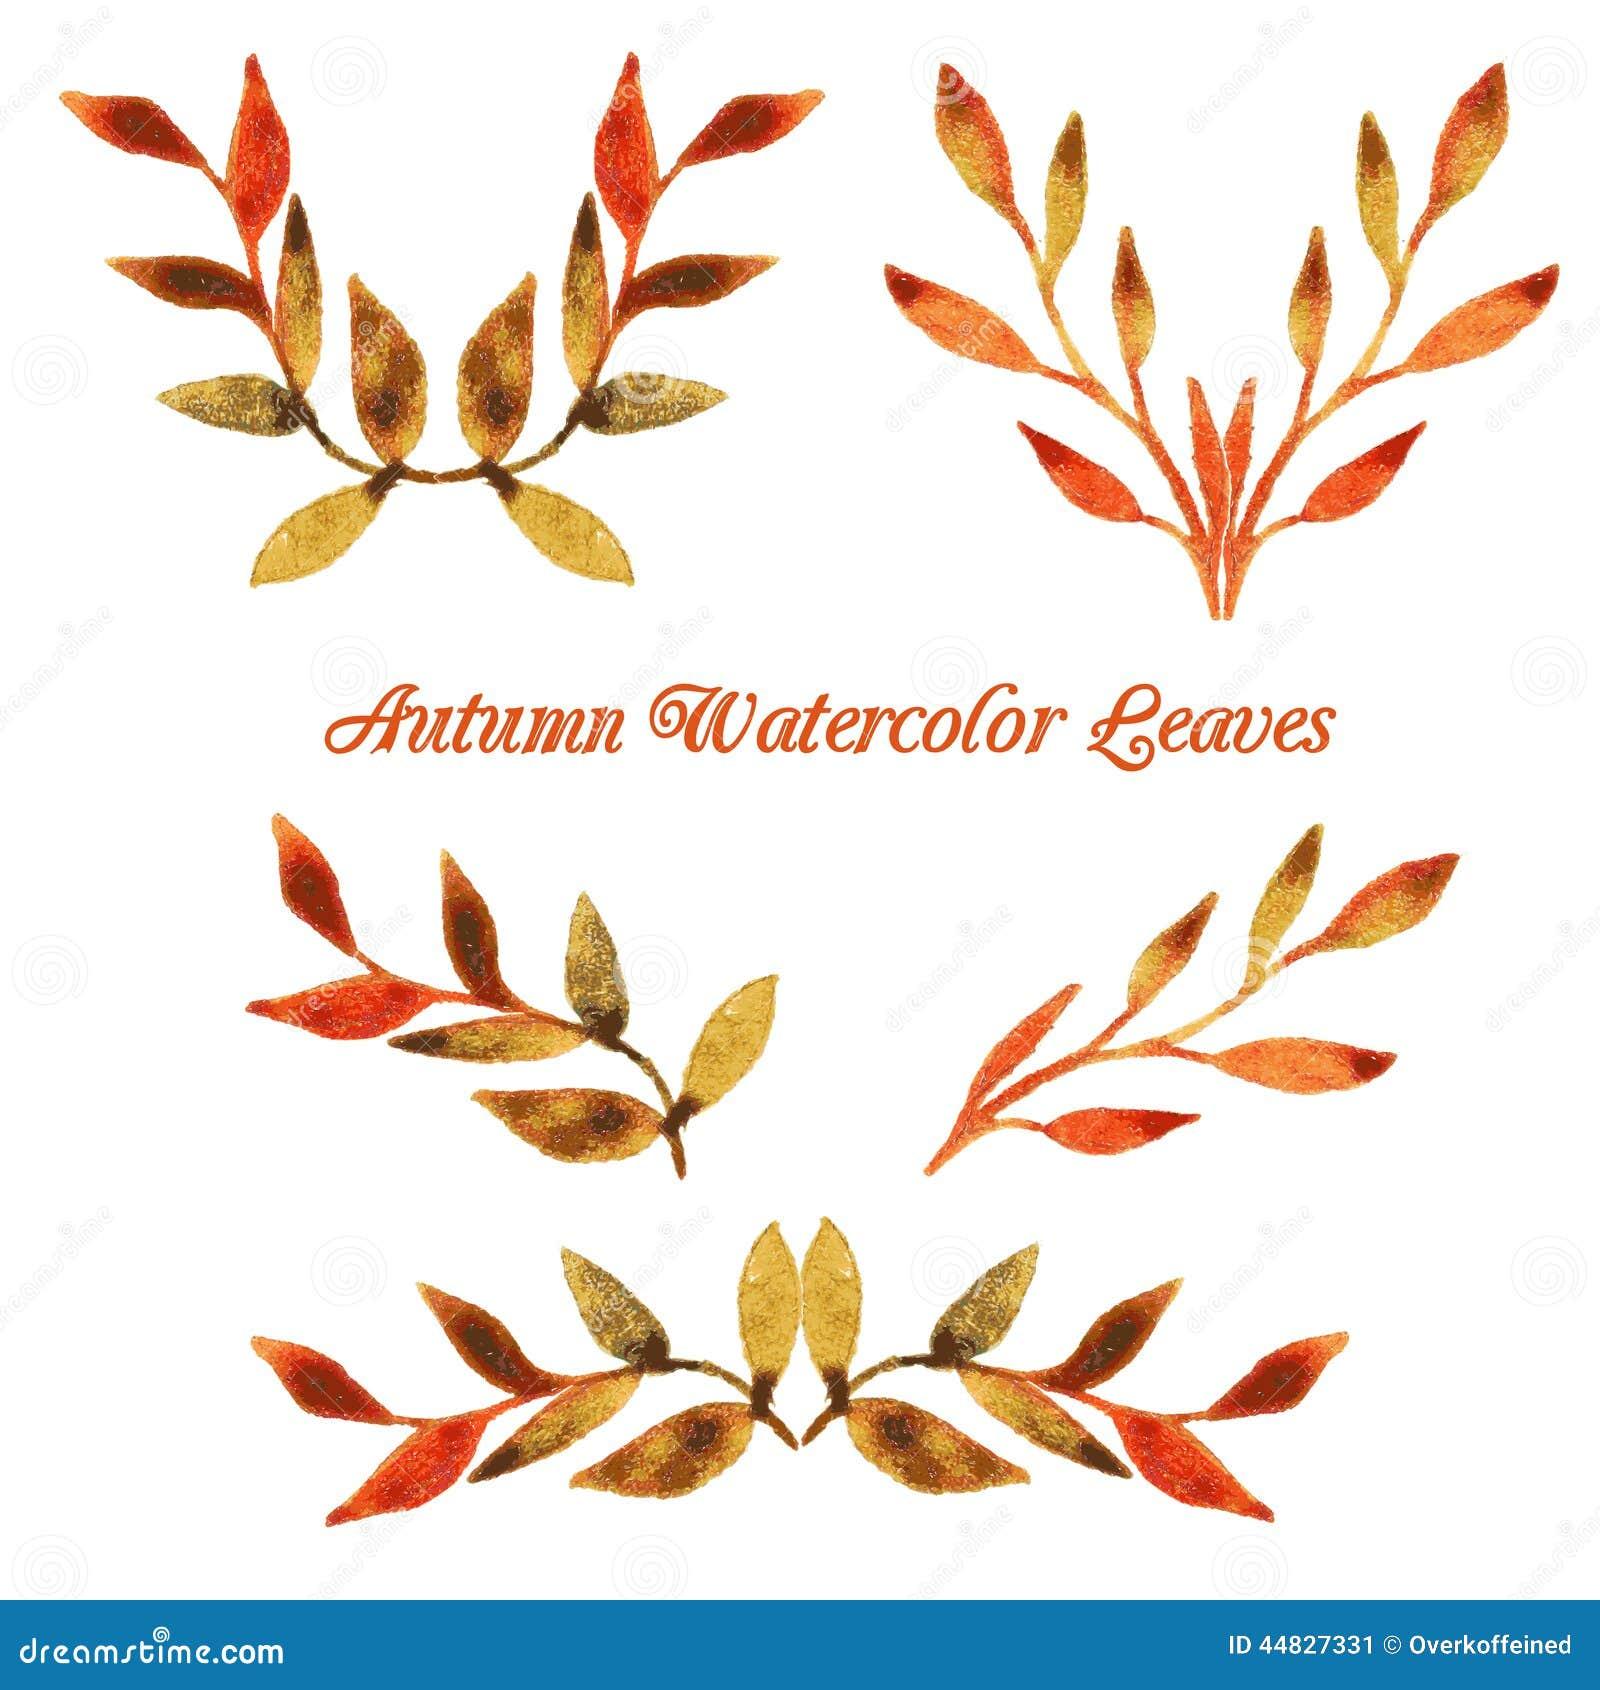 Vector autumn watercolor leaf pattern template stock vector download vector autumn watercolor leaf pattern template stock vector illustration of autumn bright maxwellsz